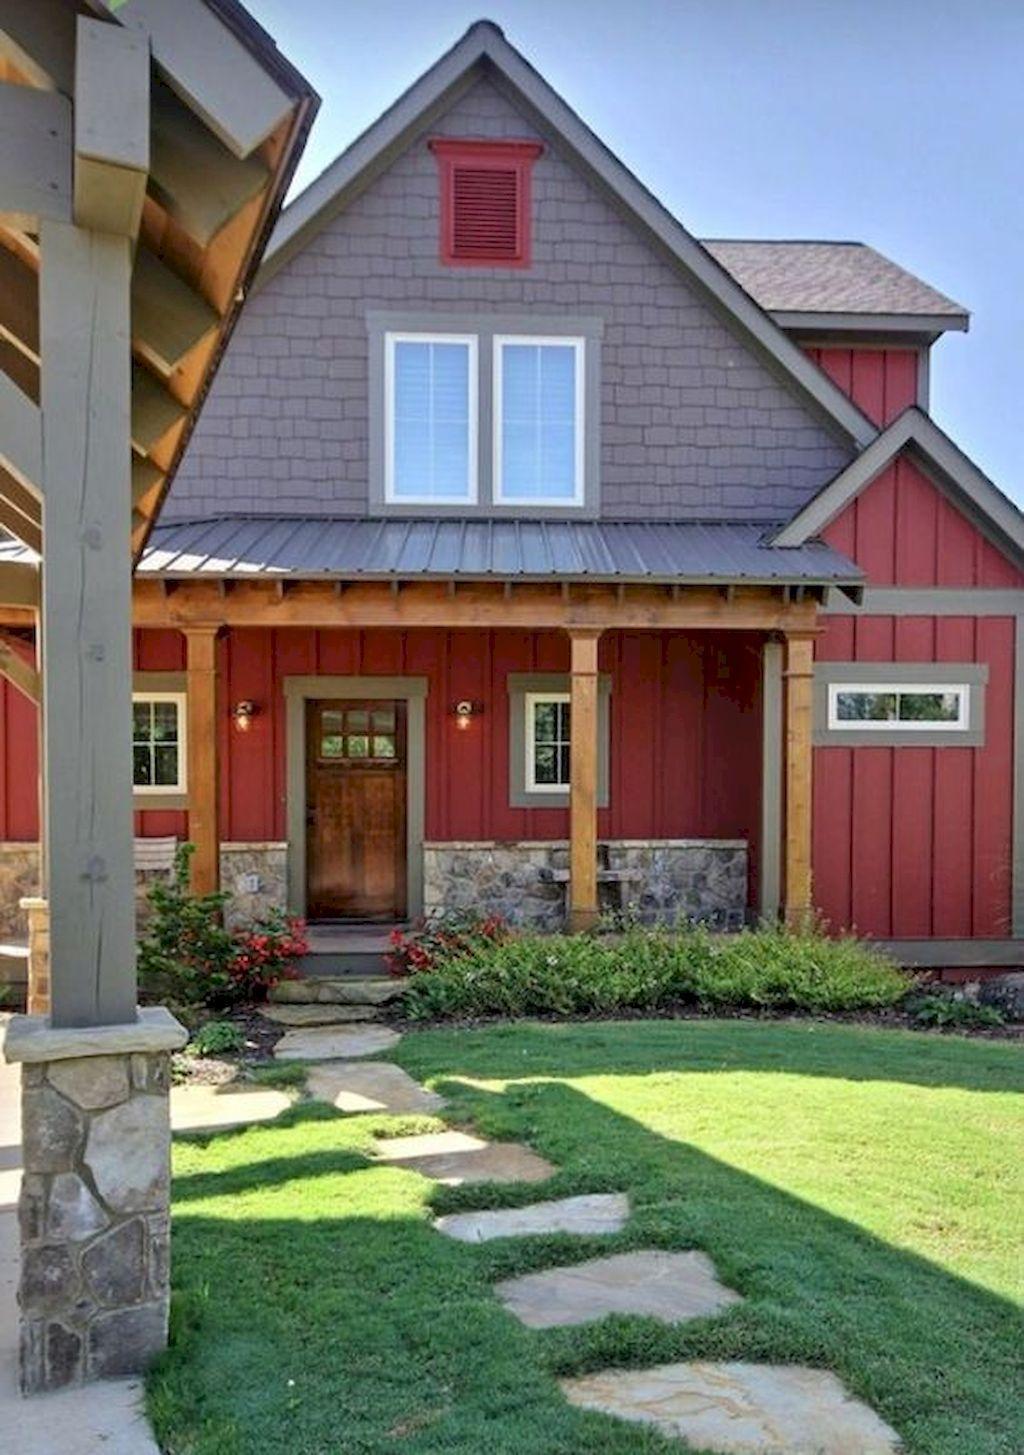 37 Best Modern Farmhouse Exterior Design Ideas in 2020